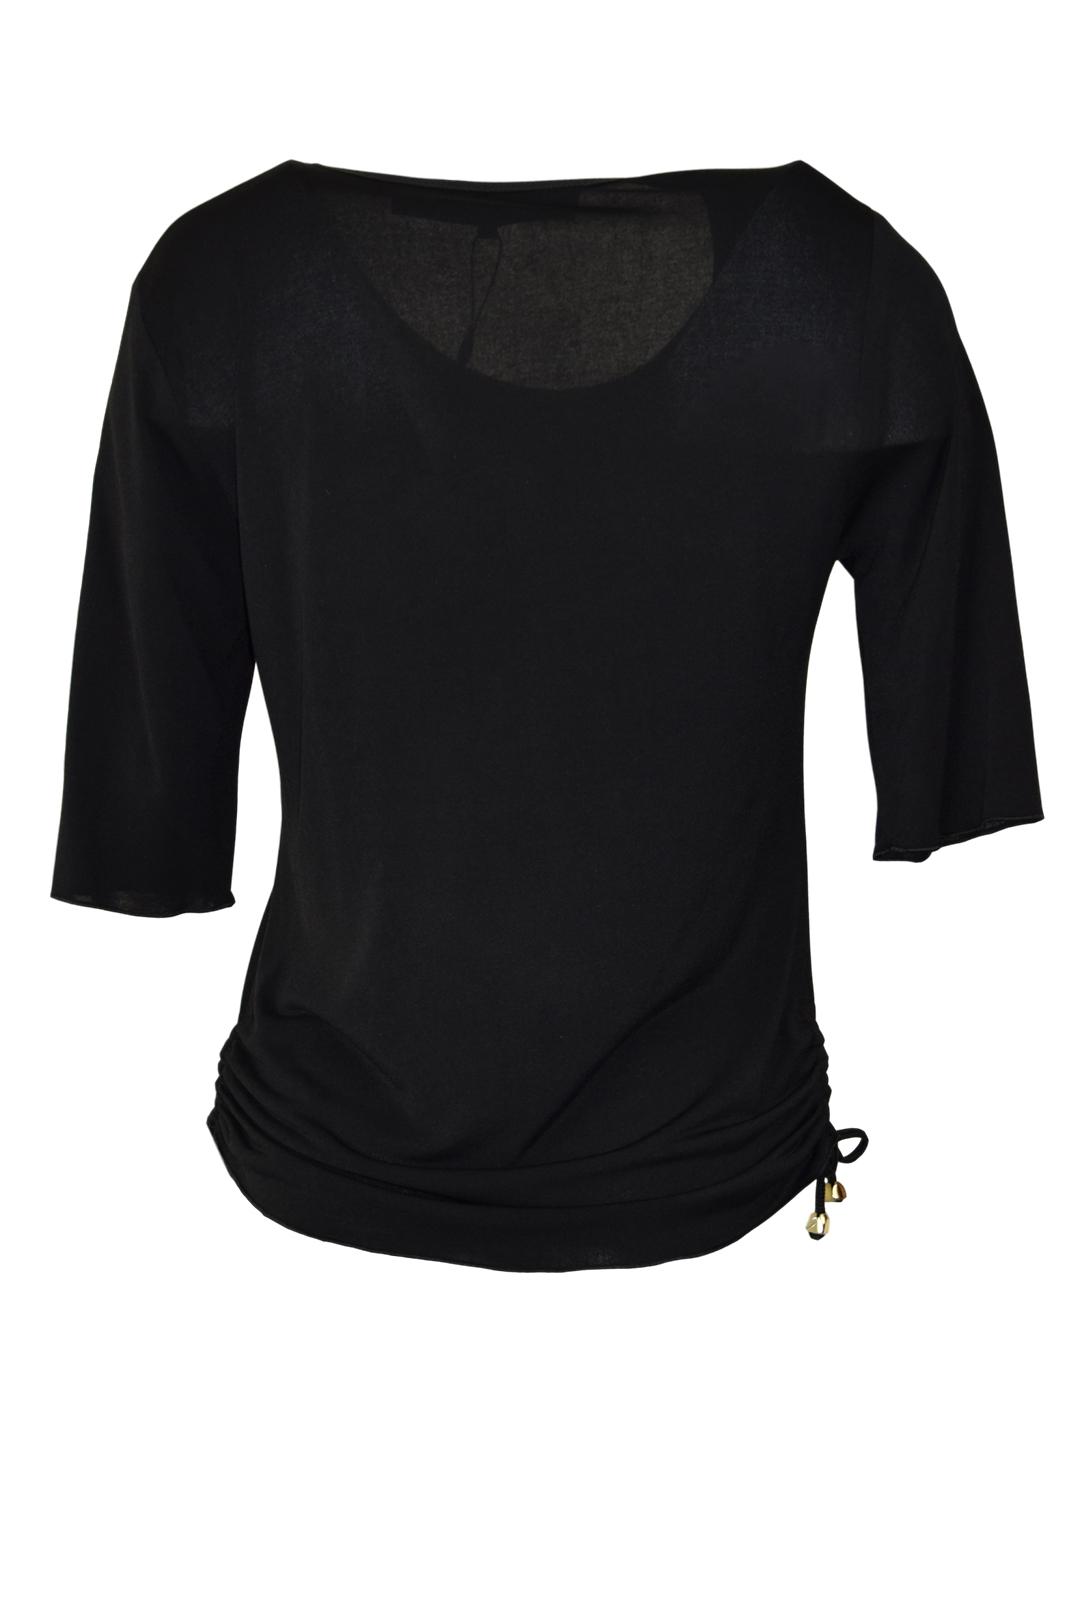 T-Shirt Single-Jersey KA